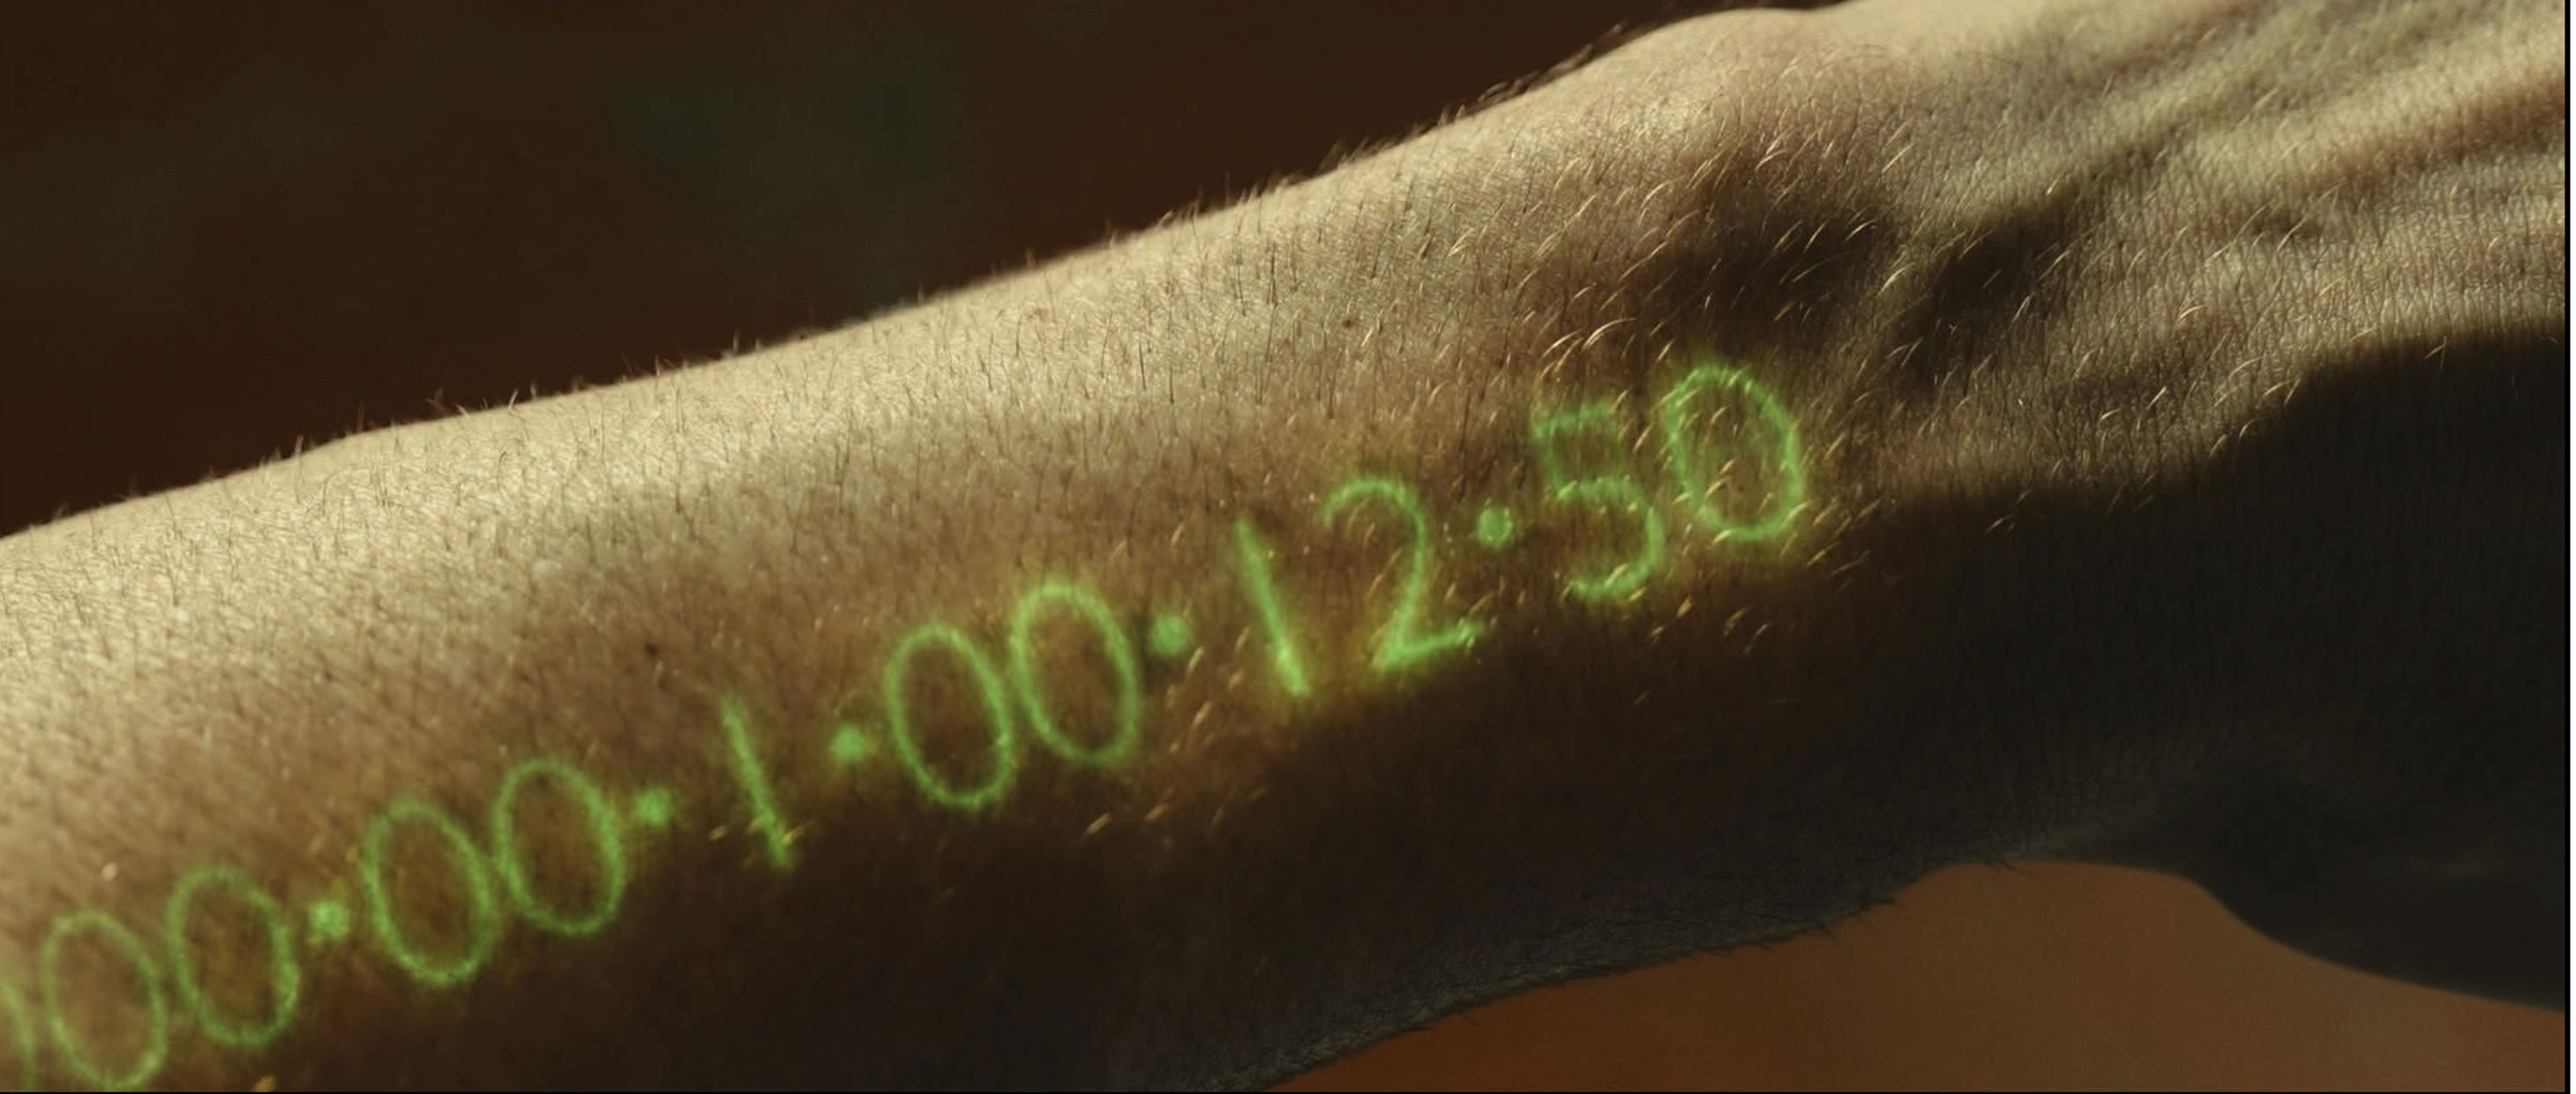 Кадр из фильма «Время» (In Time), 2011